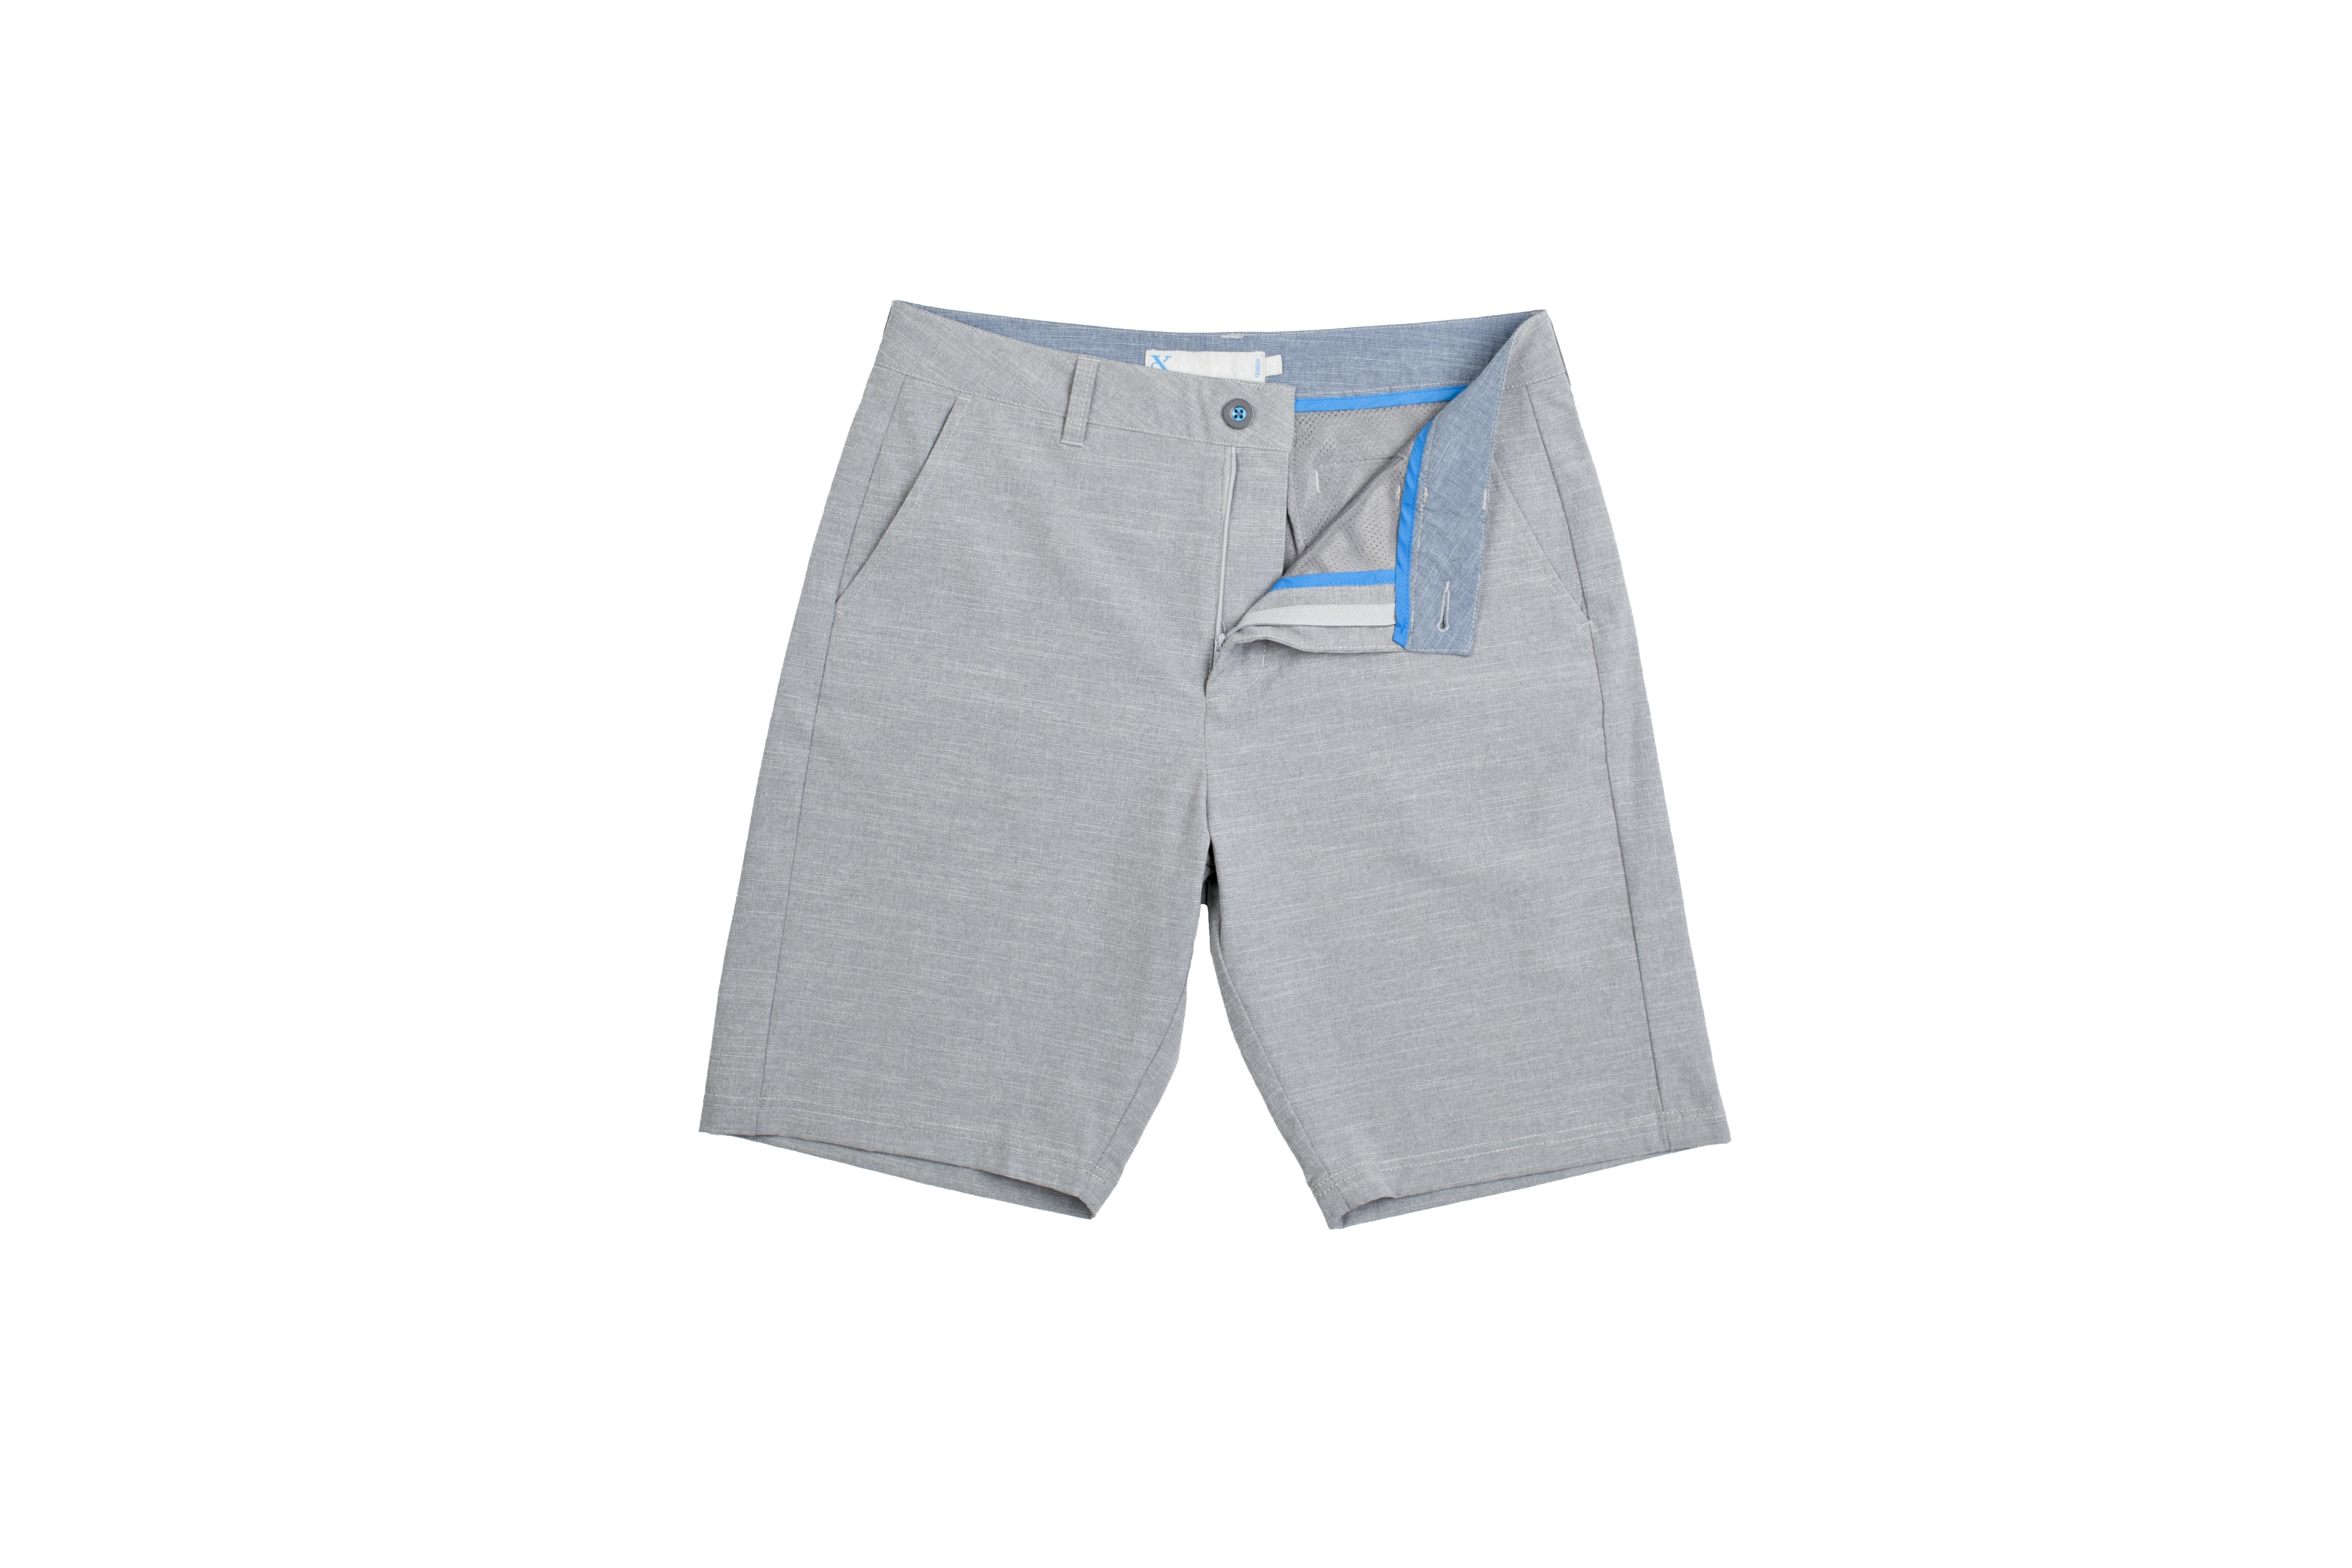 Cruiser Hybrid shorts